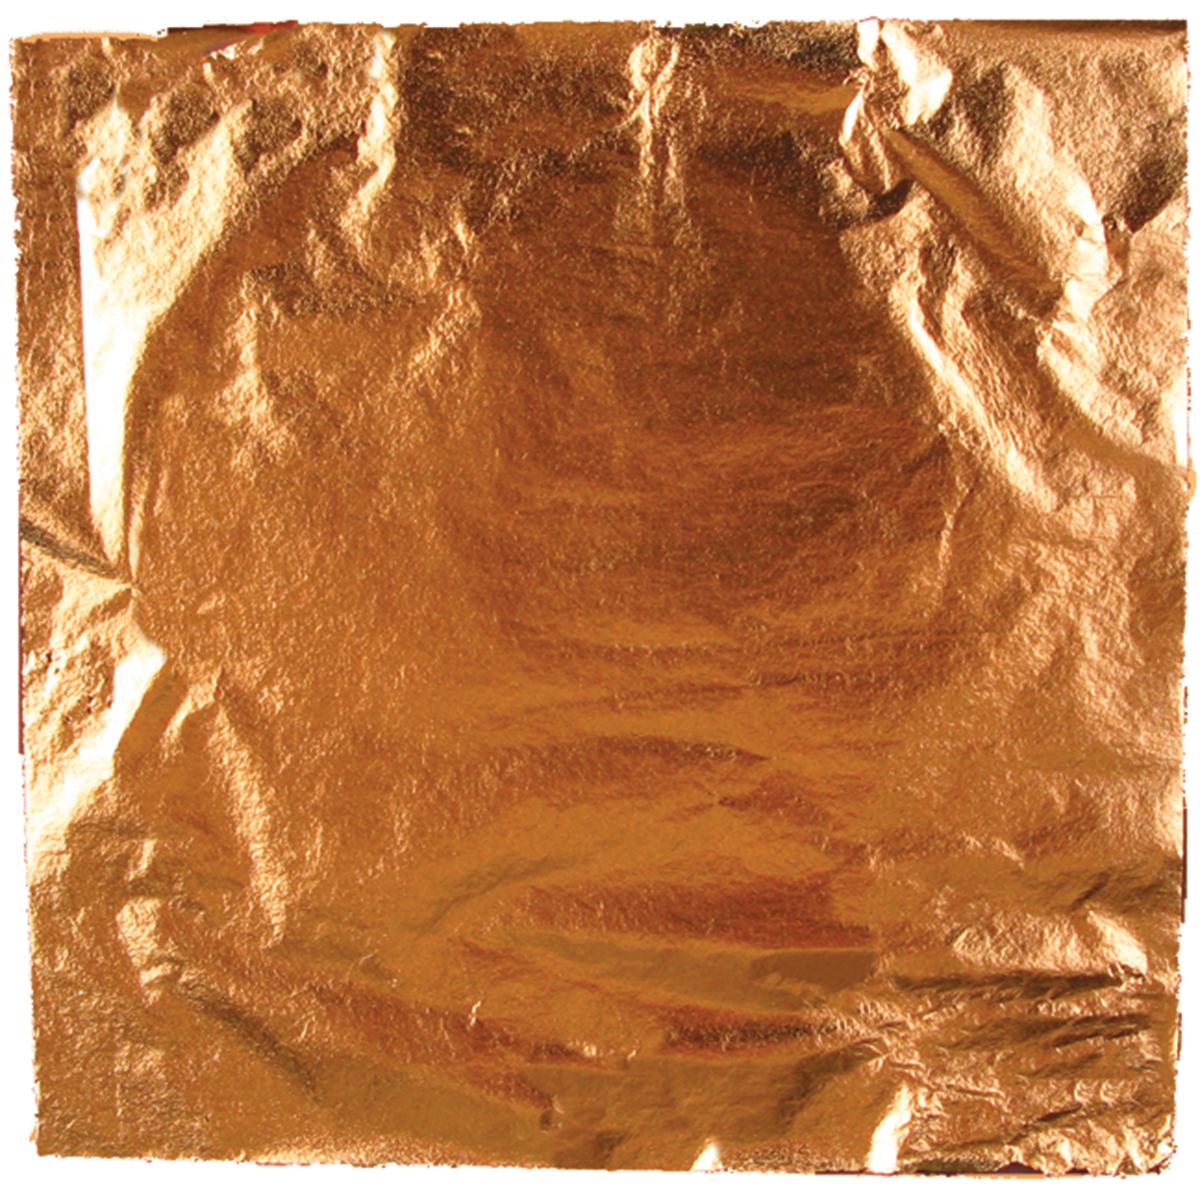 Mona Lisa Metal Leaf Flakes 3g-Copper